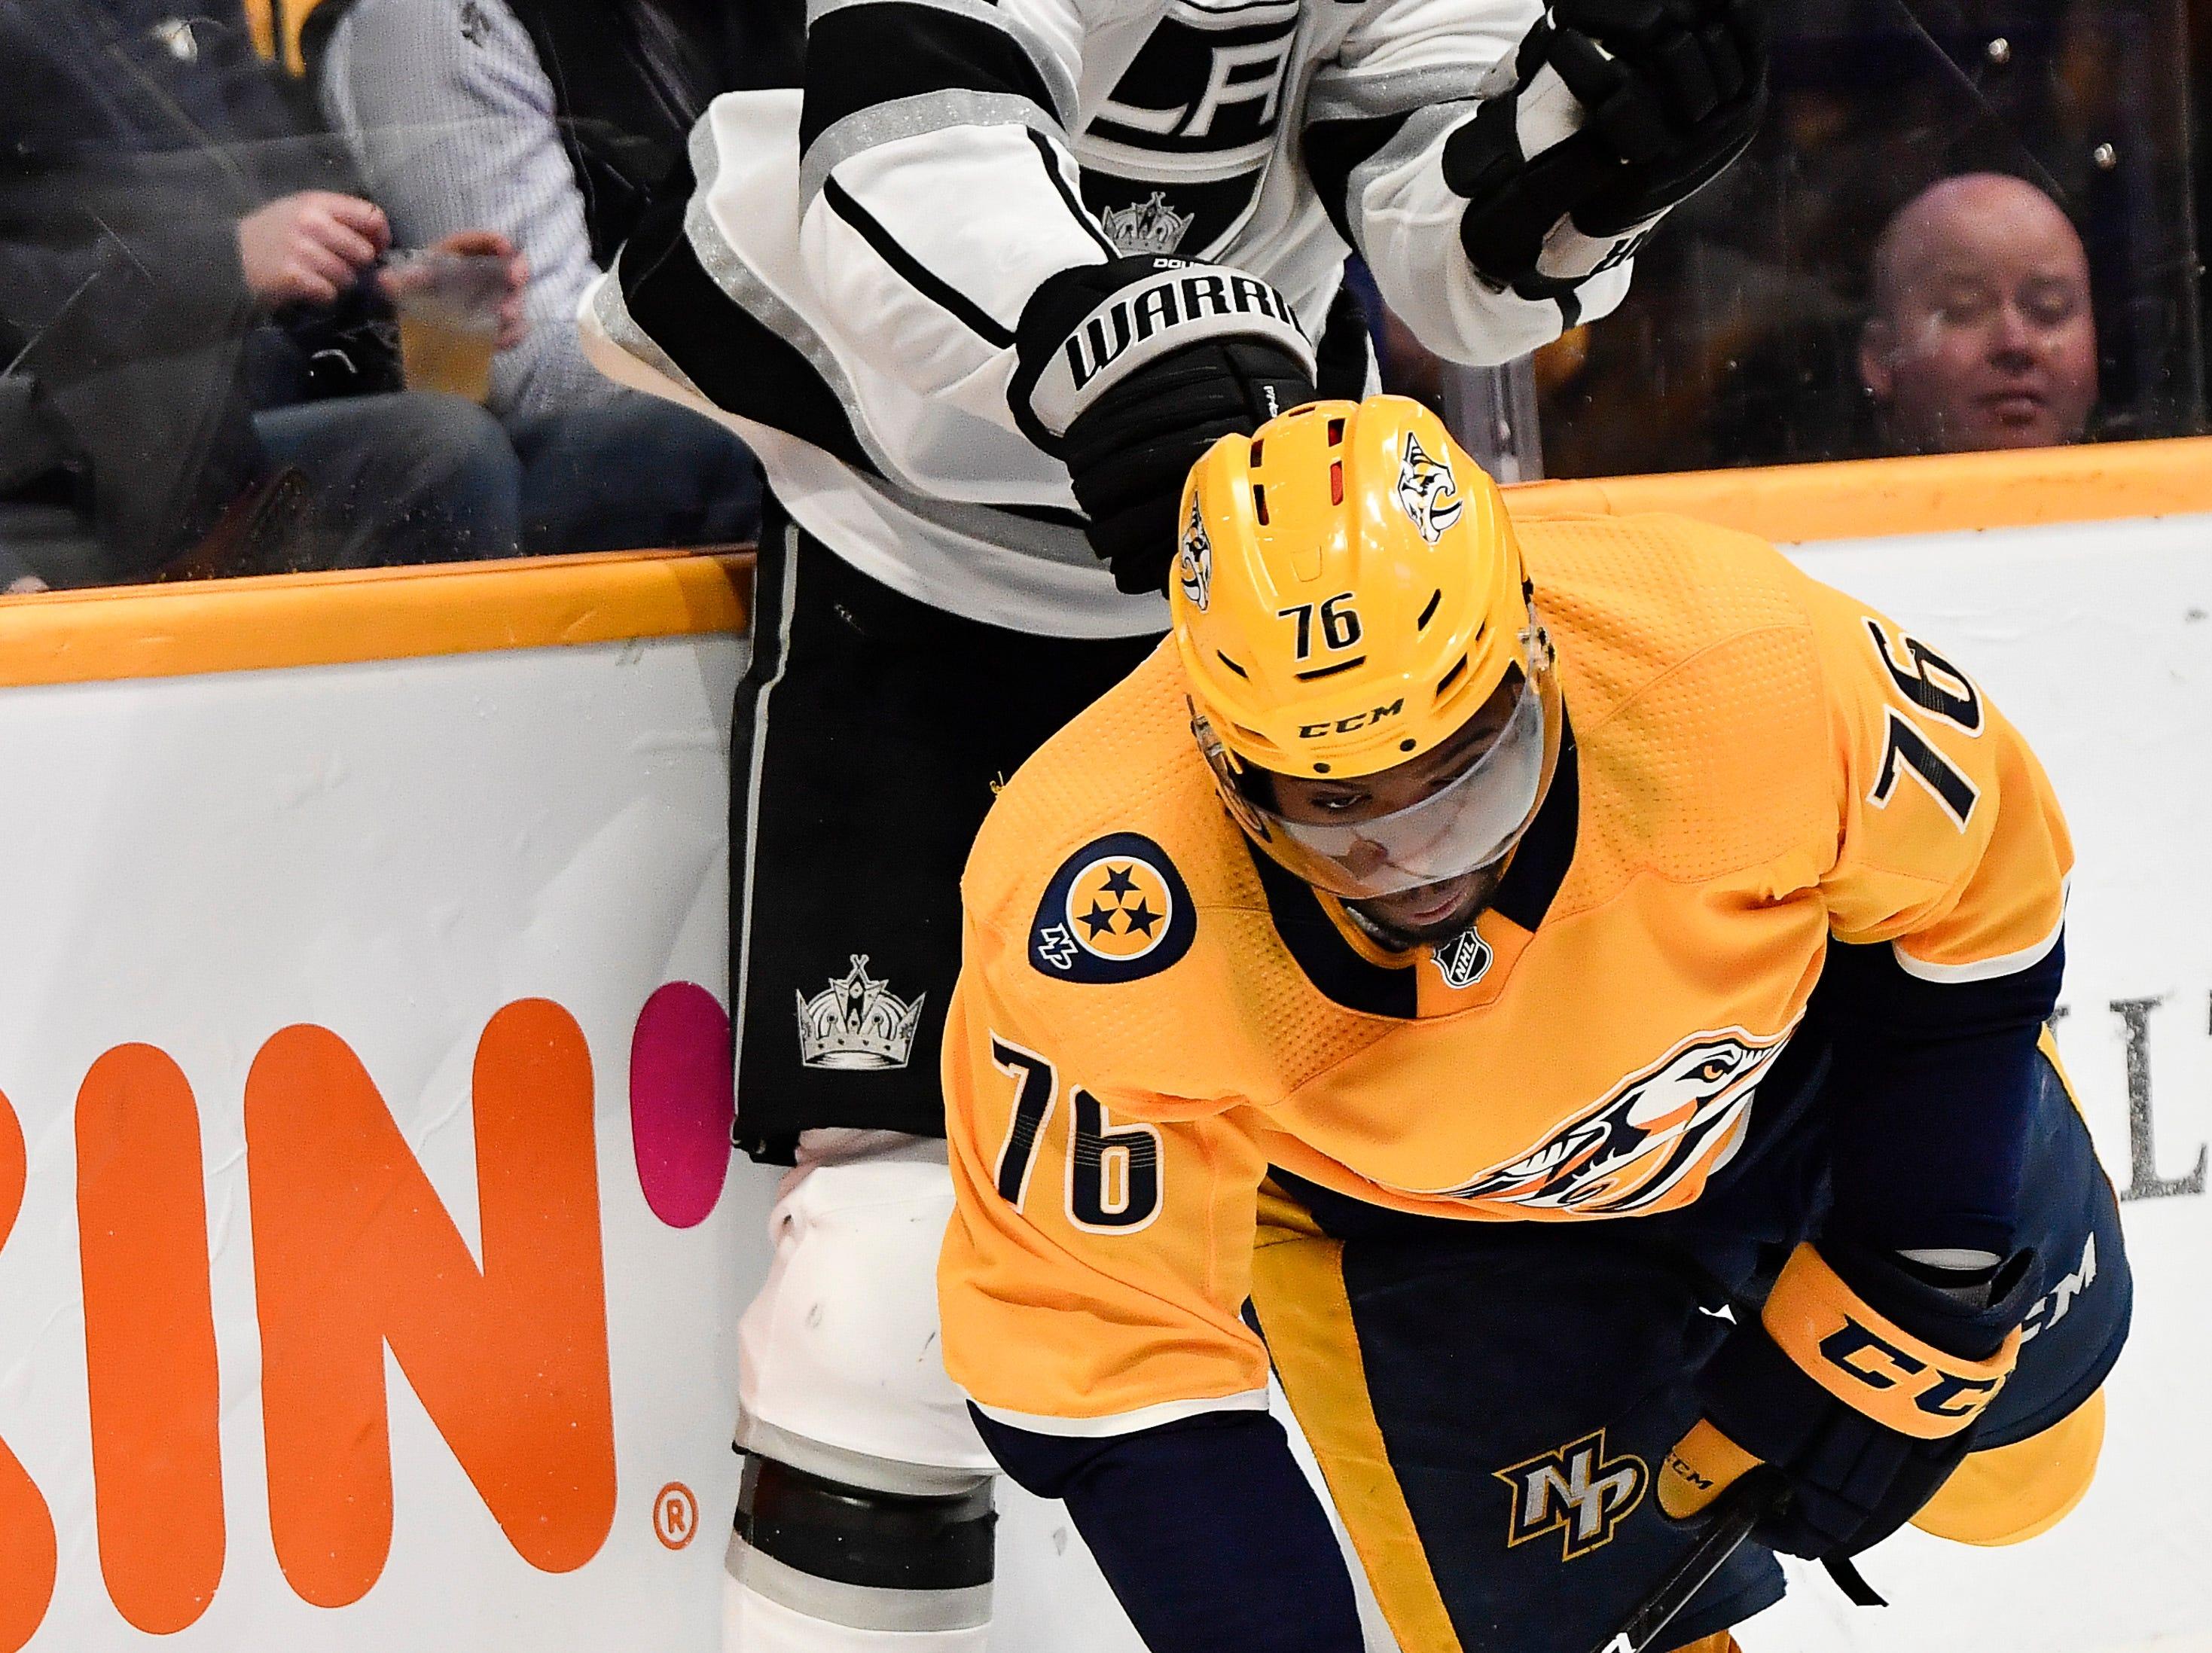 Predators defenseman P.K. Subban (76) passes the puck past Kings defenseman Drew Doughty (8) last he falls to the ice during the third period at Bridgestone Arena Thursday, Feb. 21, 2019 in Nashville, Tenn.